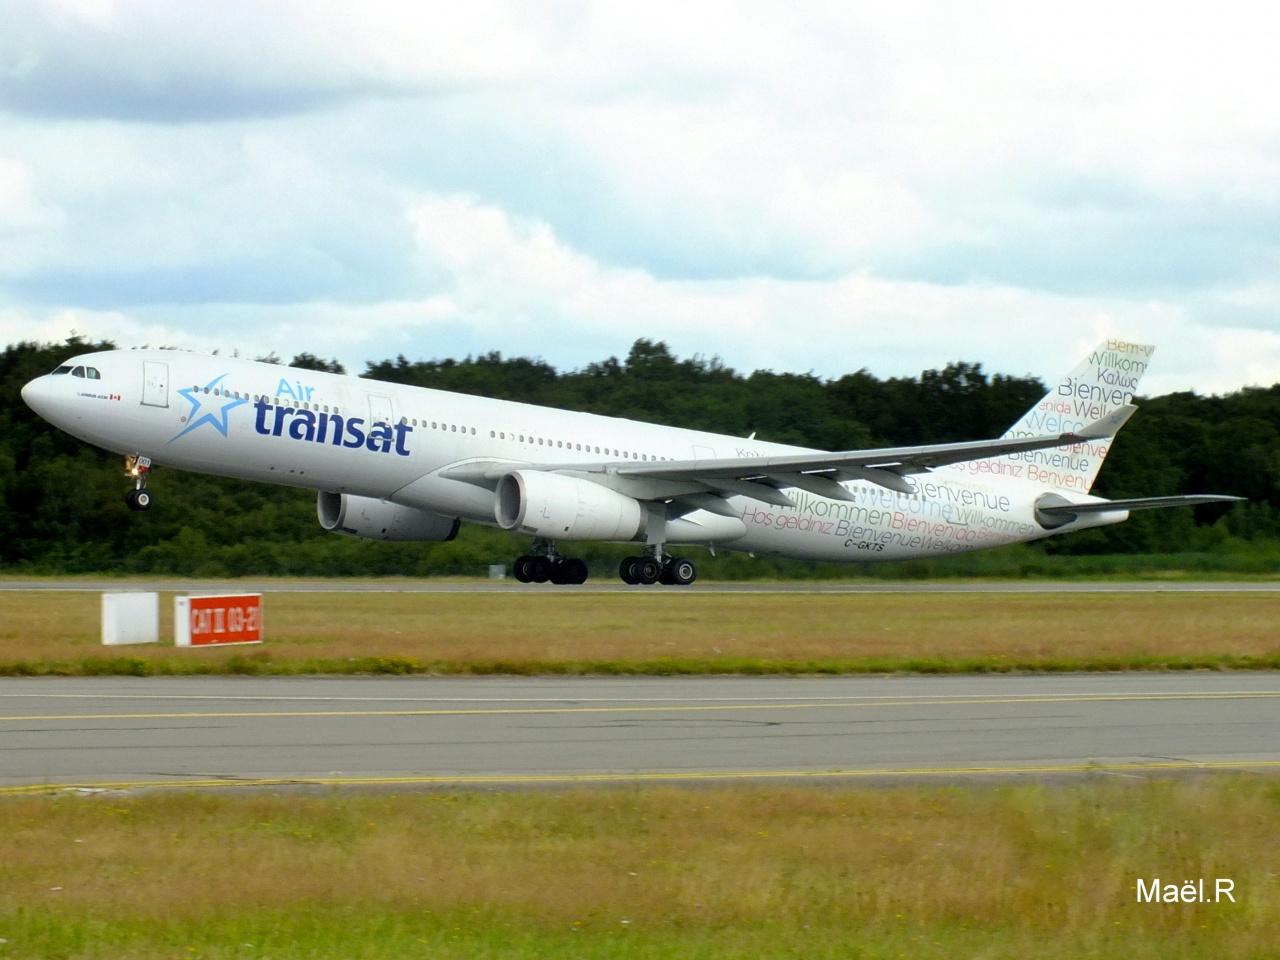 [08/07/2014] Airbus A330-300 (C-GKTS) Air Transat 546272Juilletn7034